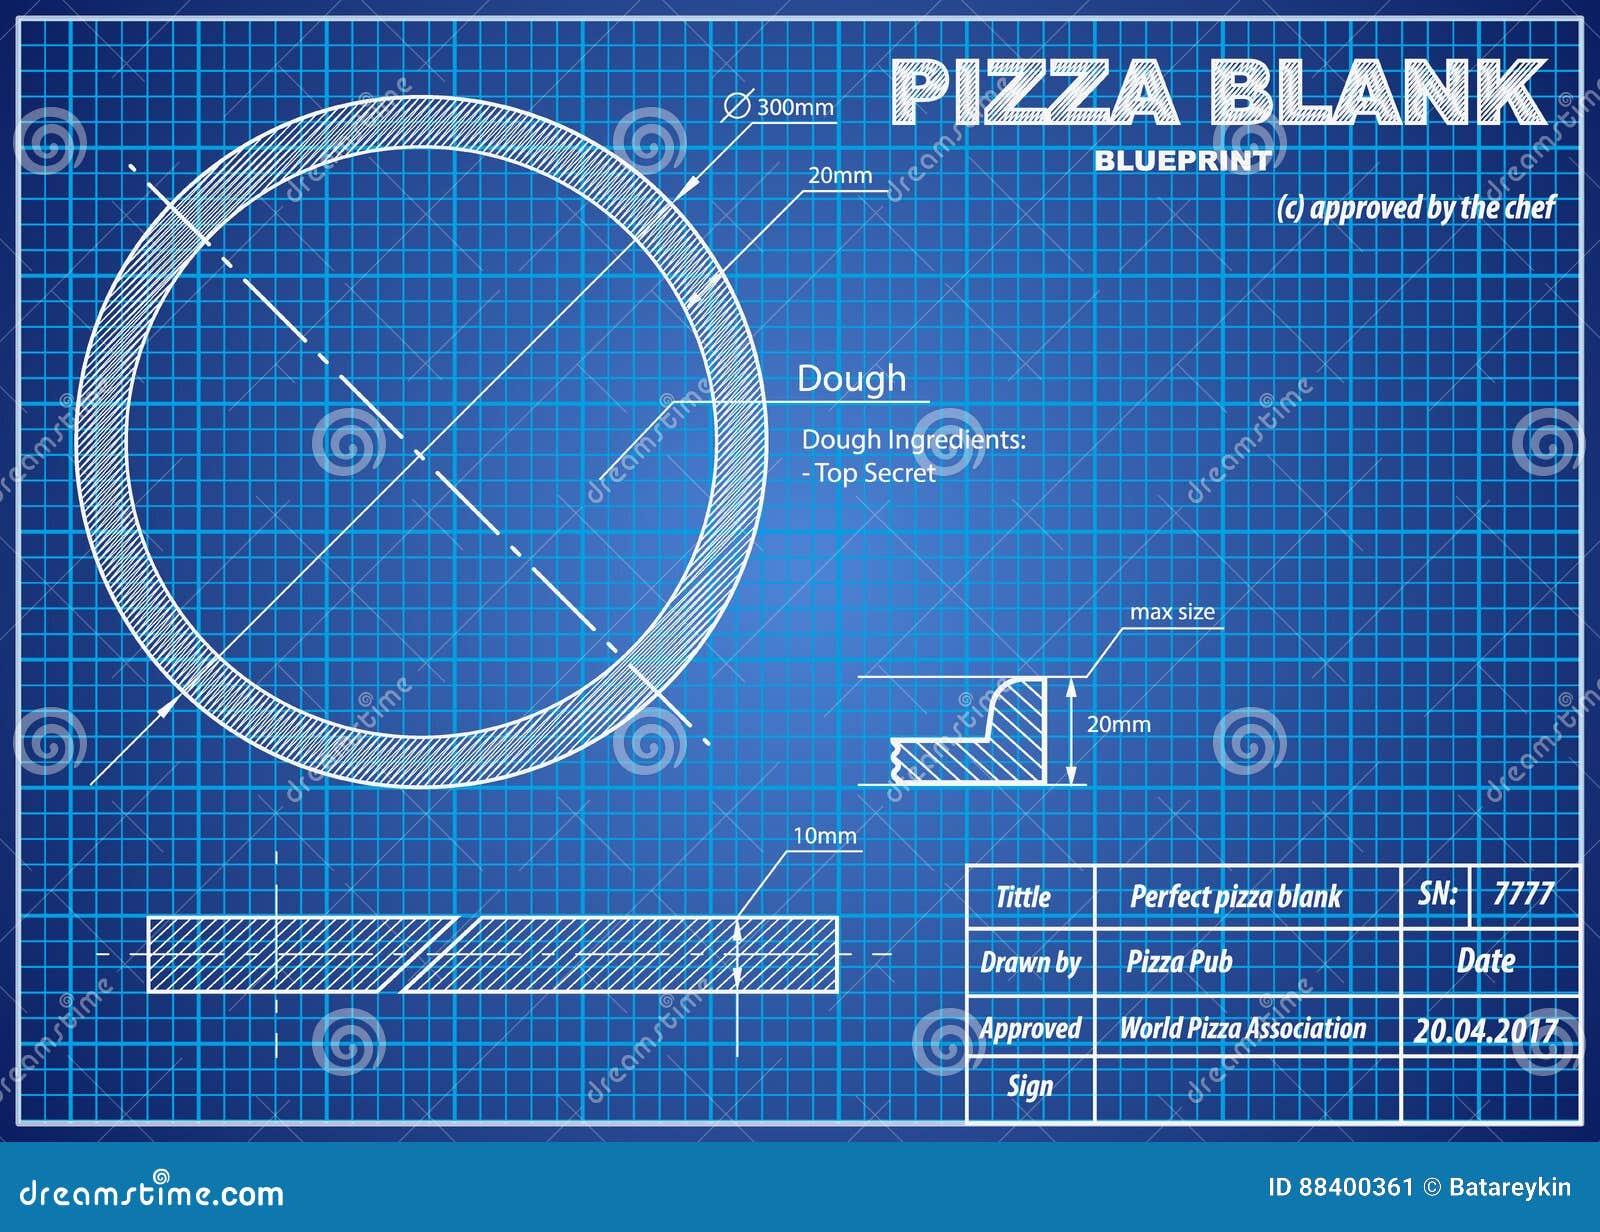 perfect pizza blank blueprint scheme stock vector illustration of